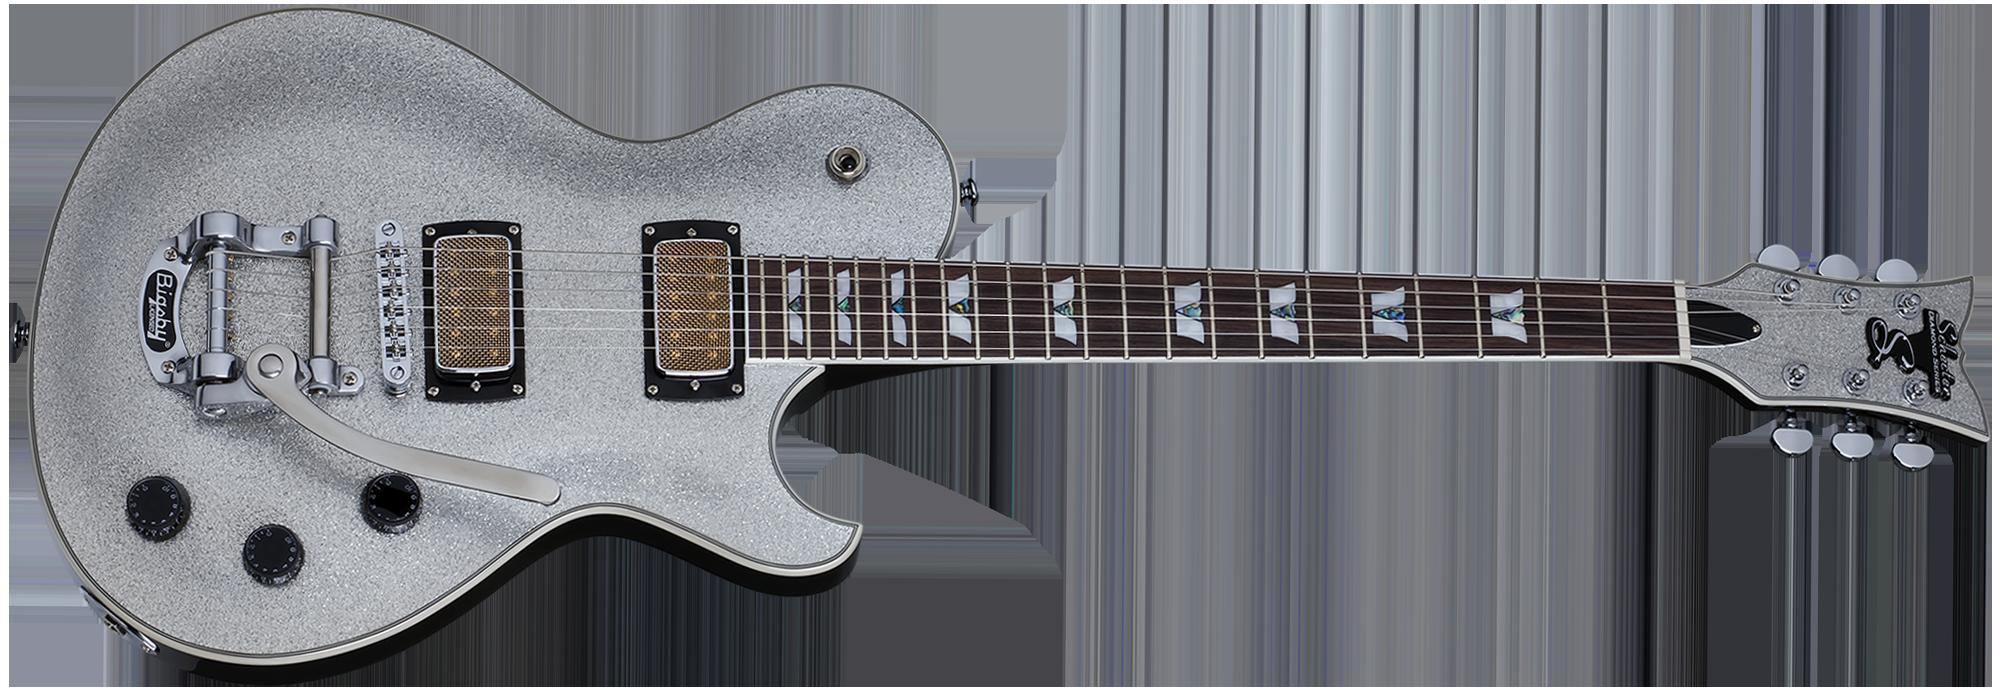 Solo-6B Silver Sparkle (SIL S) SKU #176